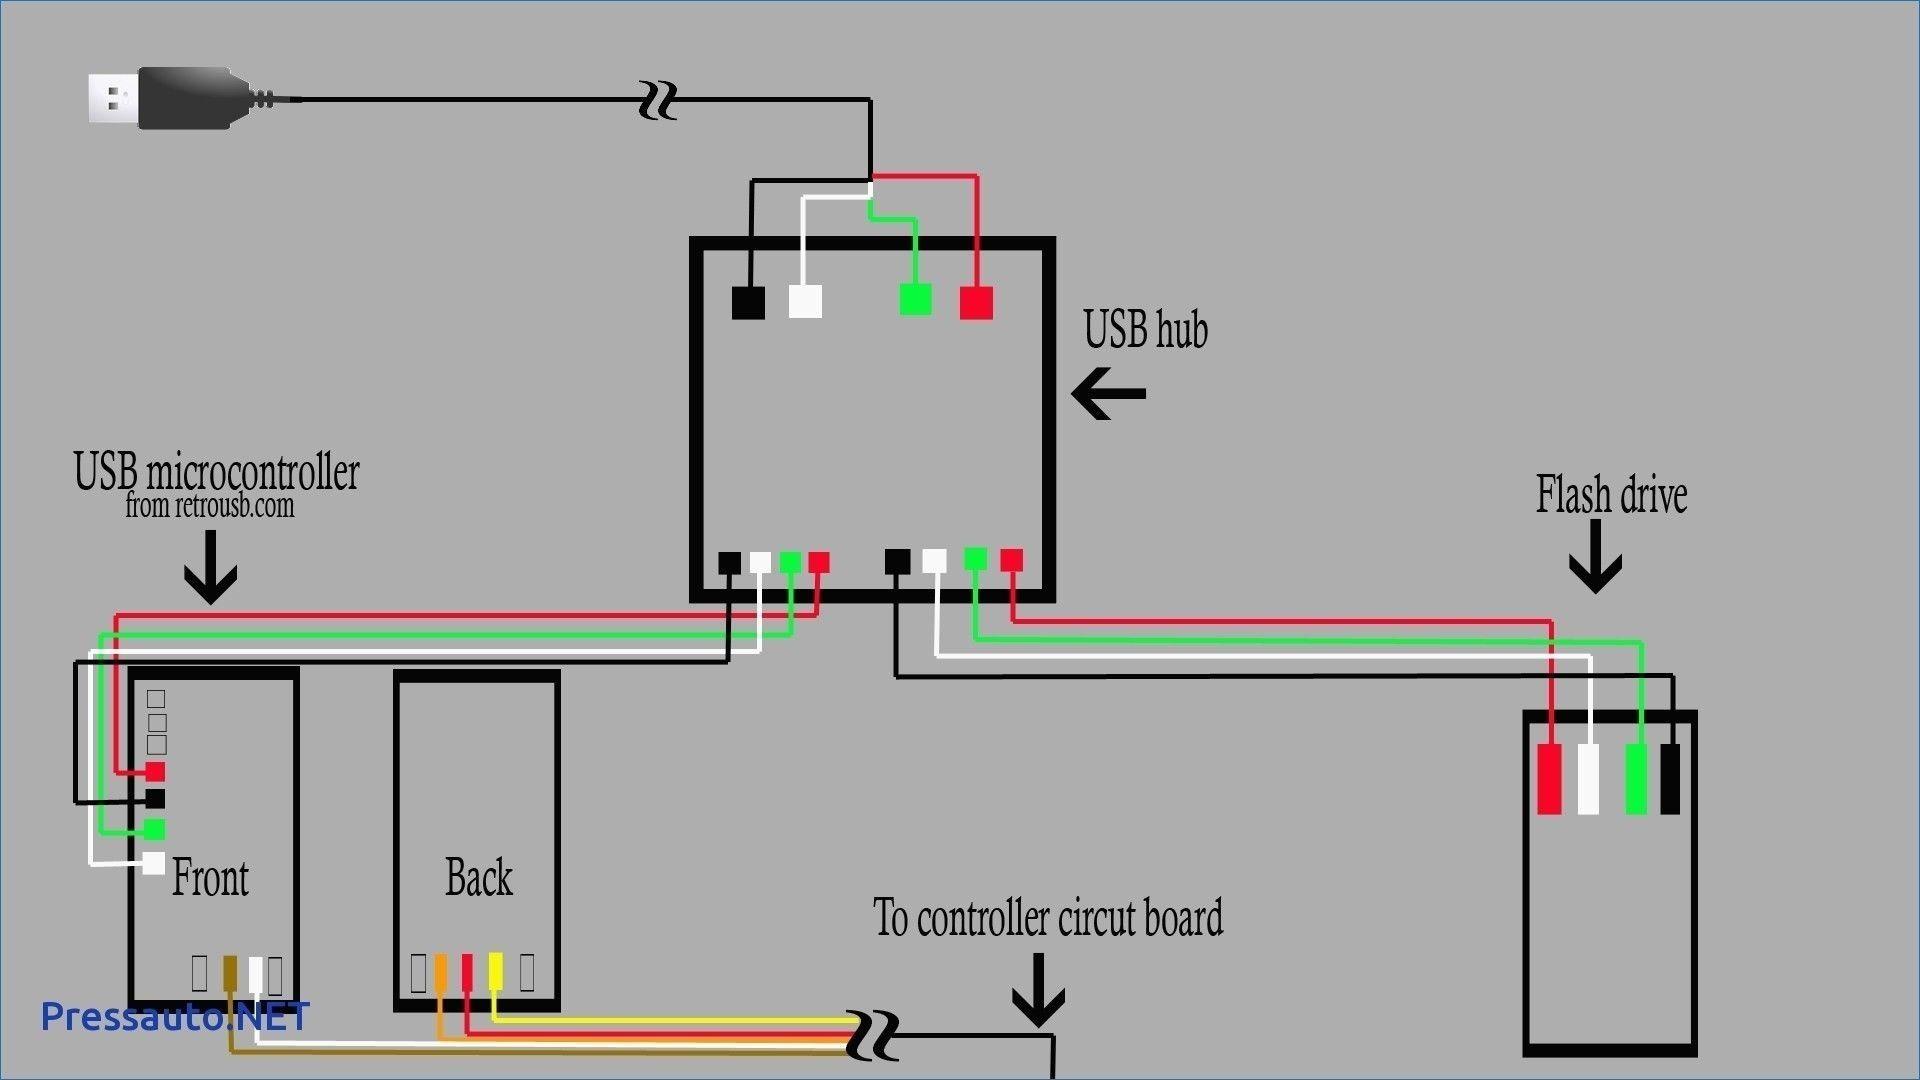 Hdmi to Rca Converter Wiring Diagram 2ccf109 Wiring Diagram for Hdmi to Rca Plugs Of Hdmi to Rca Converter Wiring Diagram